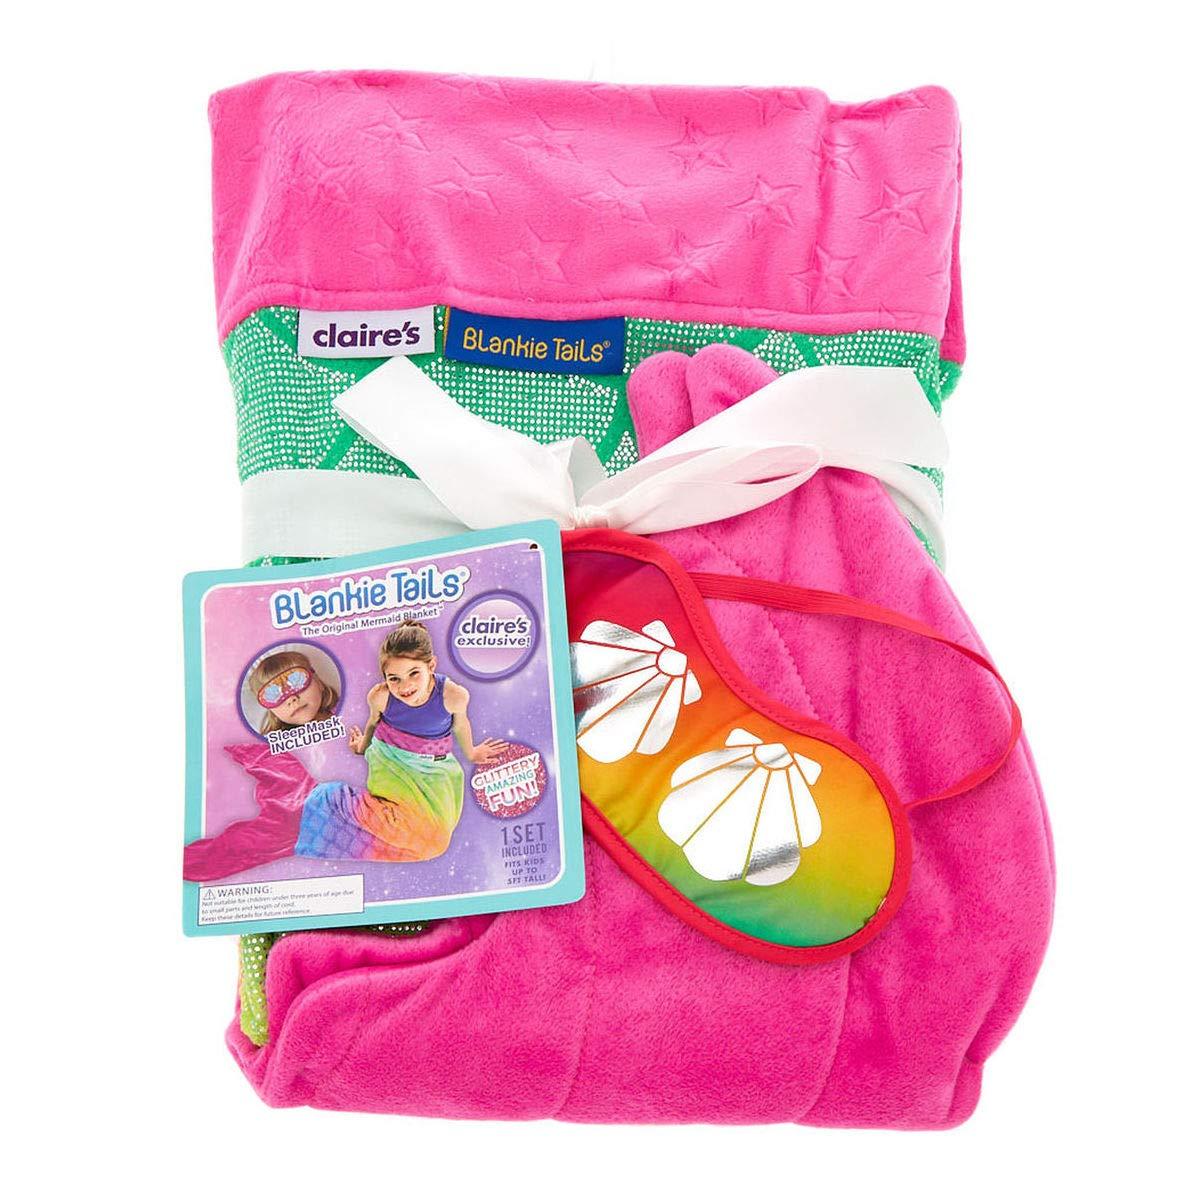 Rainbow Pink Mermaid Tail Blanket Sleep Mask Set by Claires